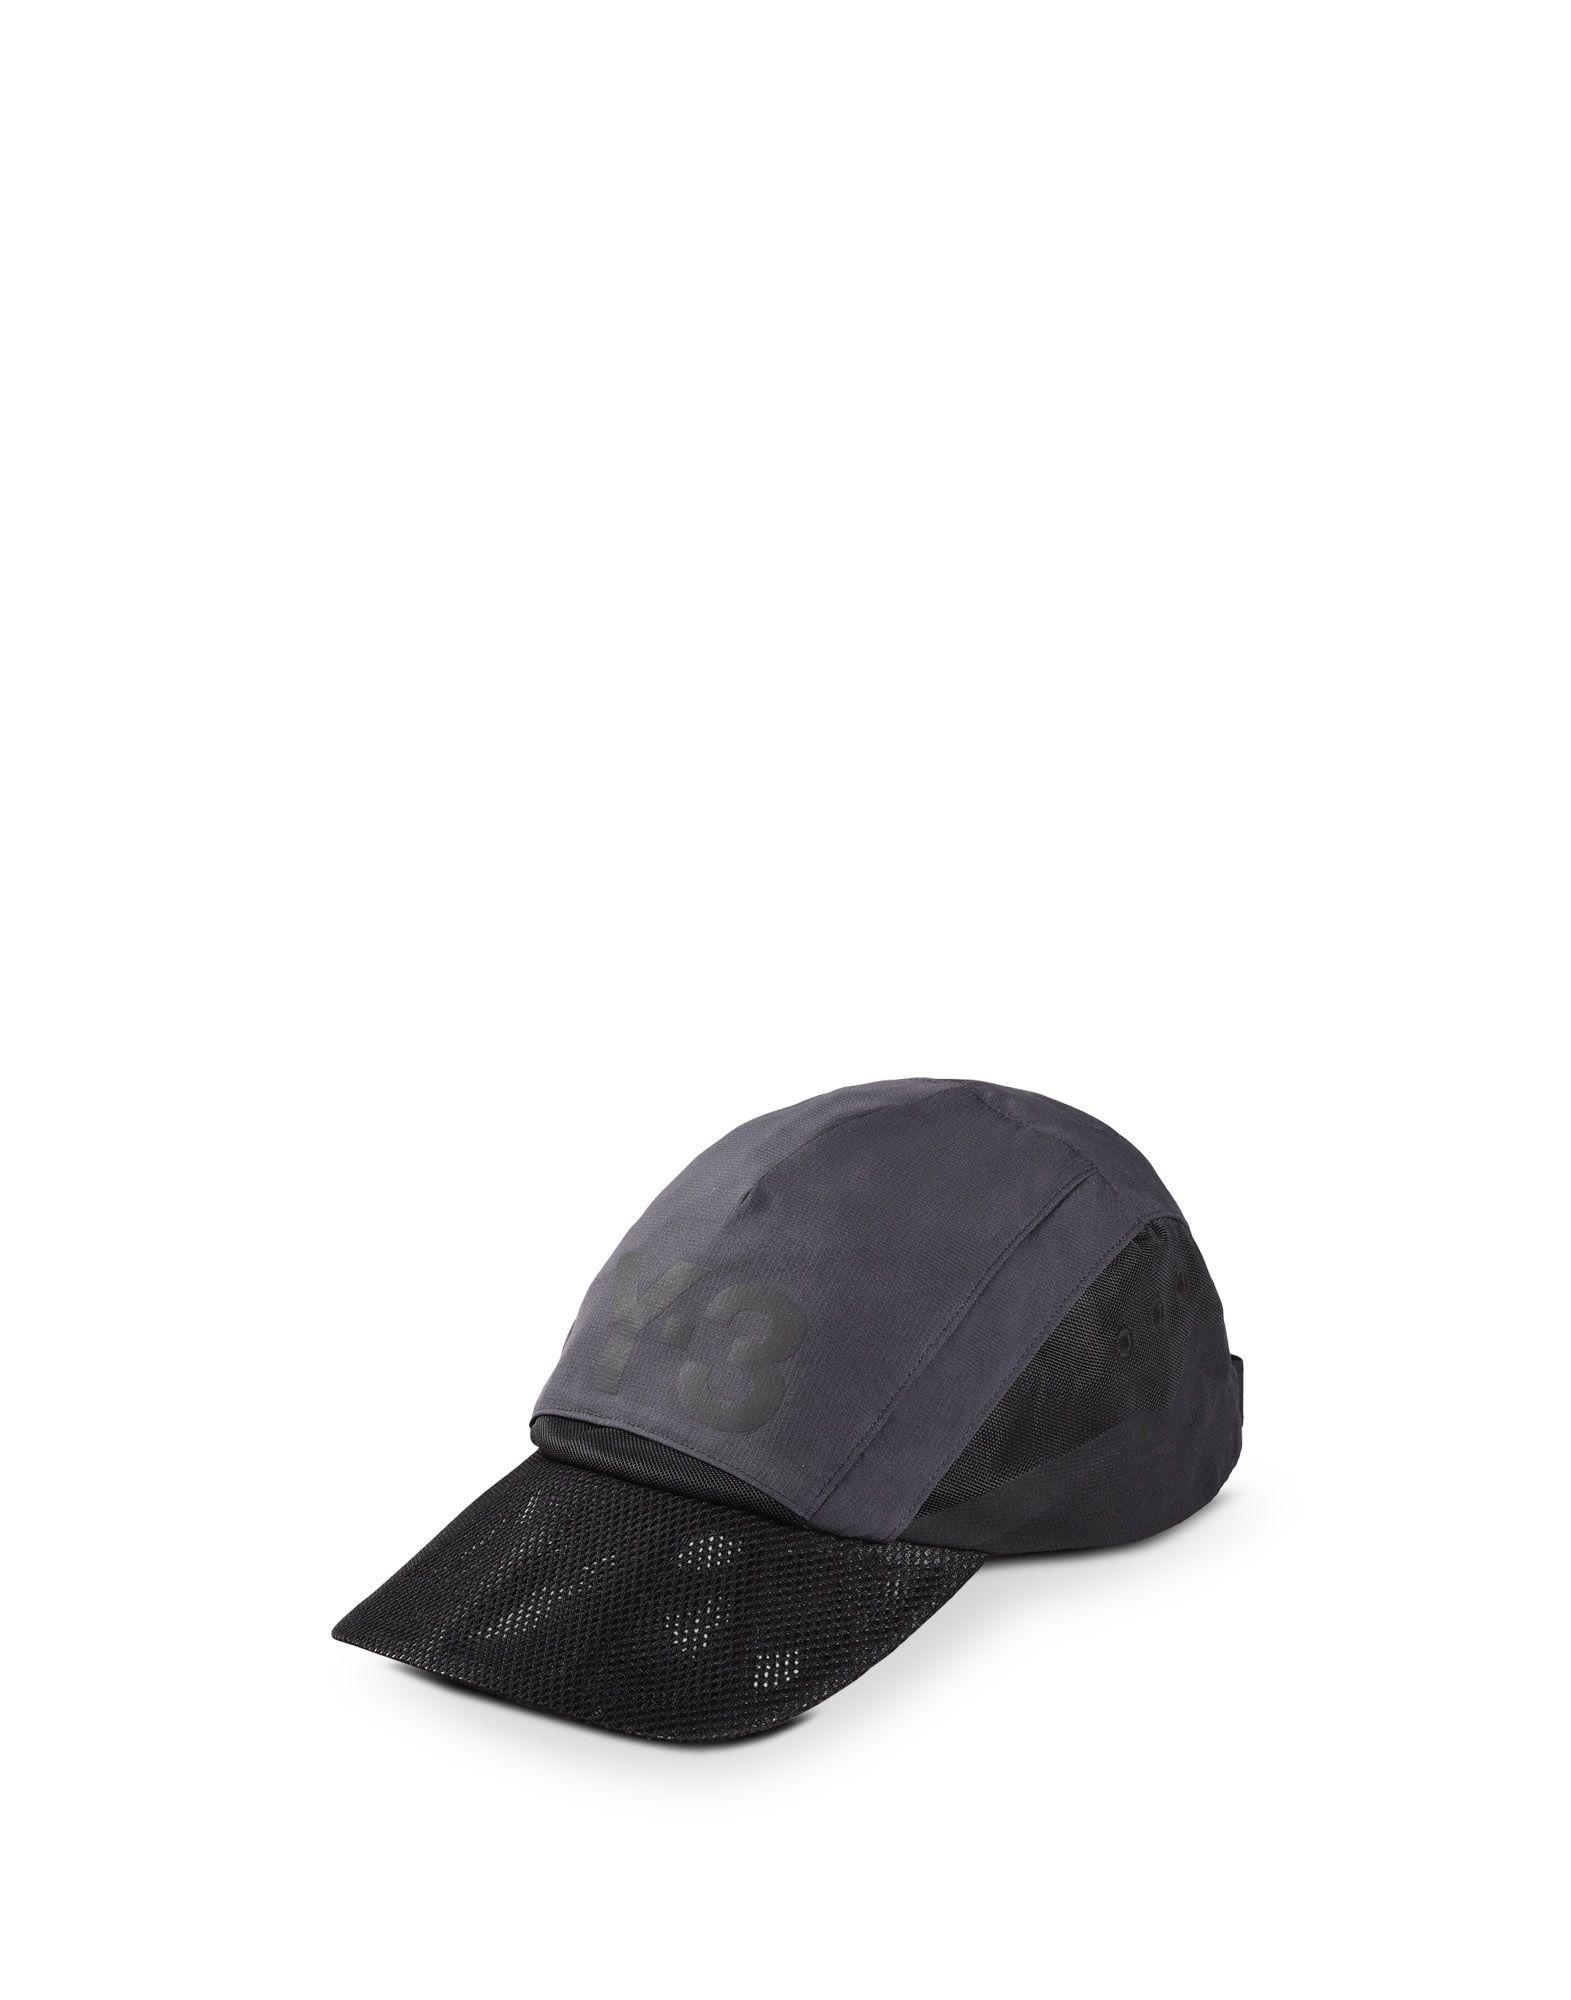 6085cff4075 Y-3 RUN BLACK CAP OTHER ACCESSORIES unisex Y-3 adidas